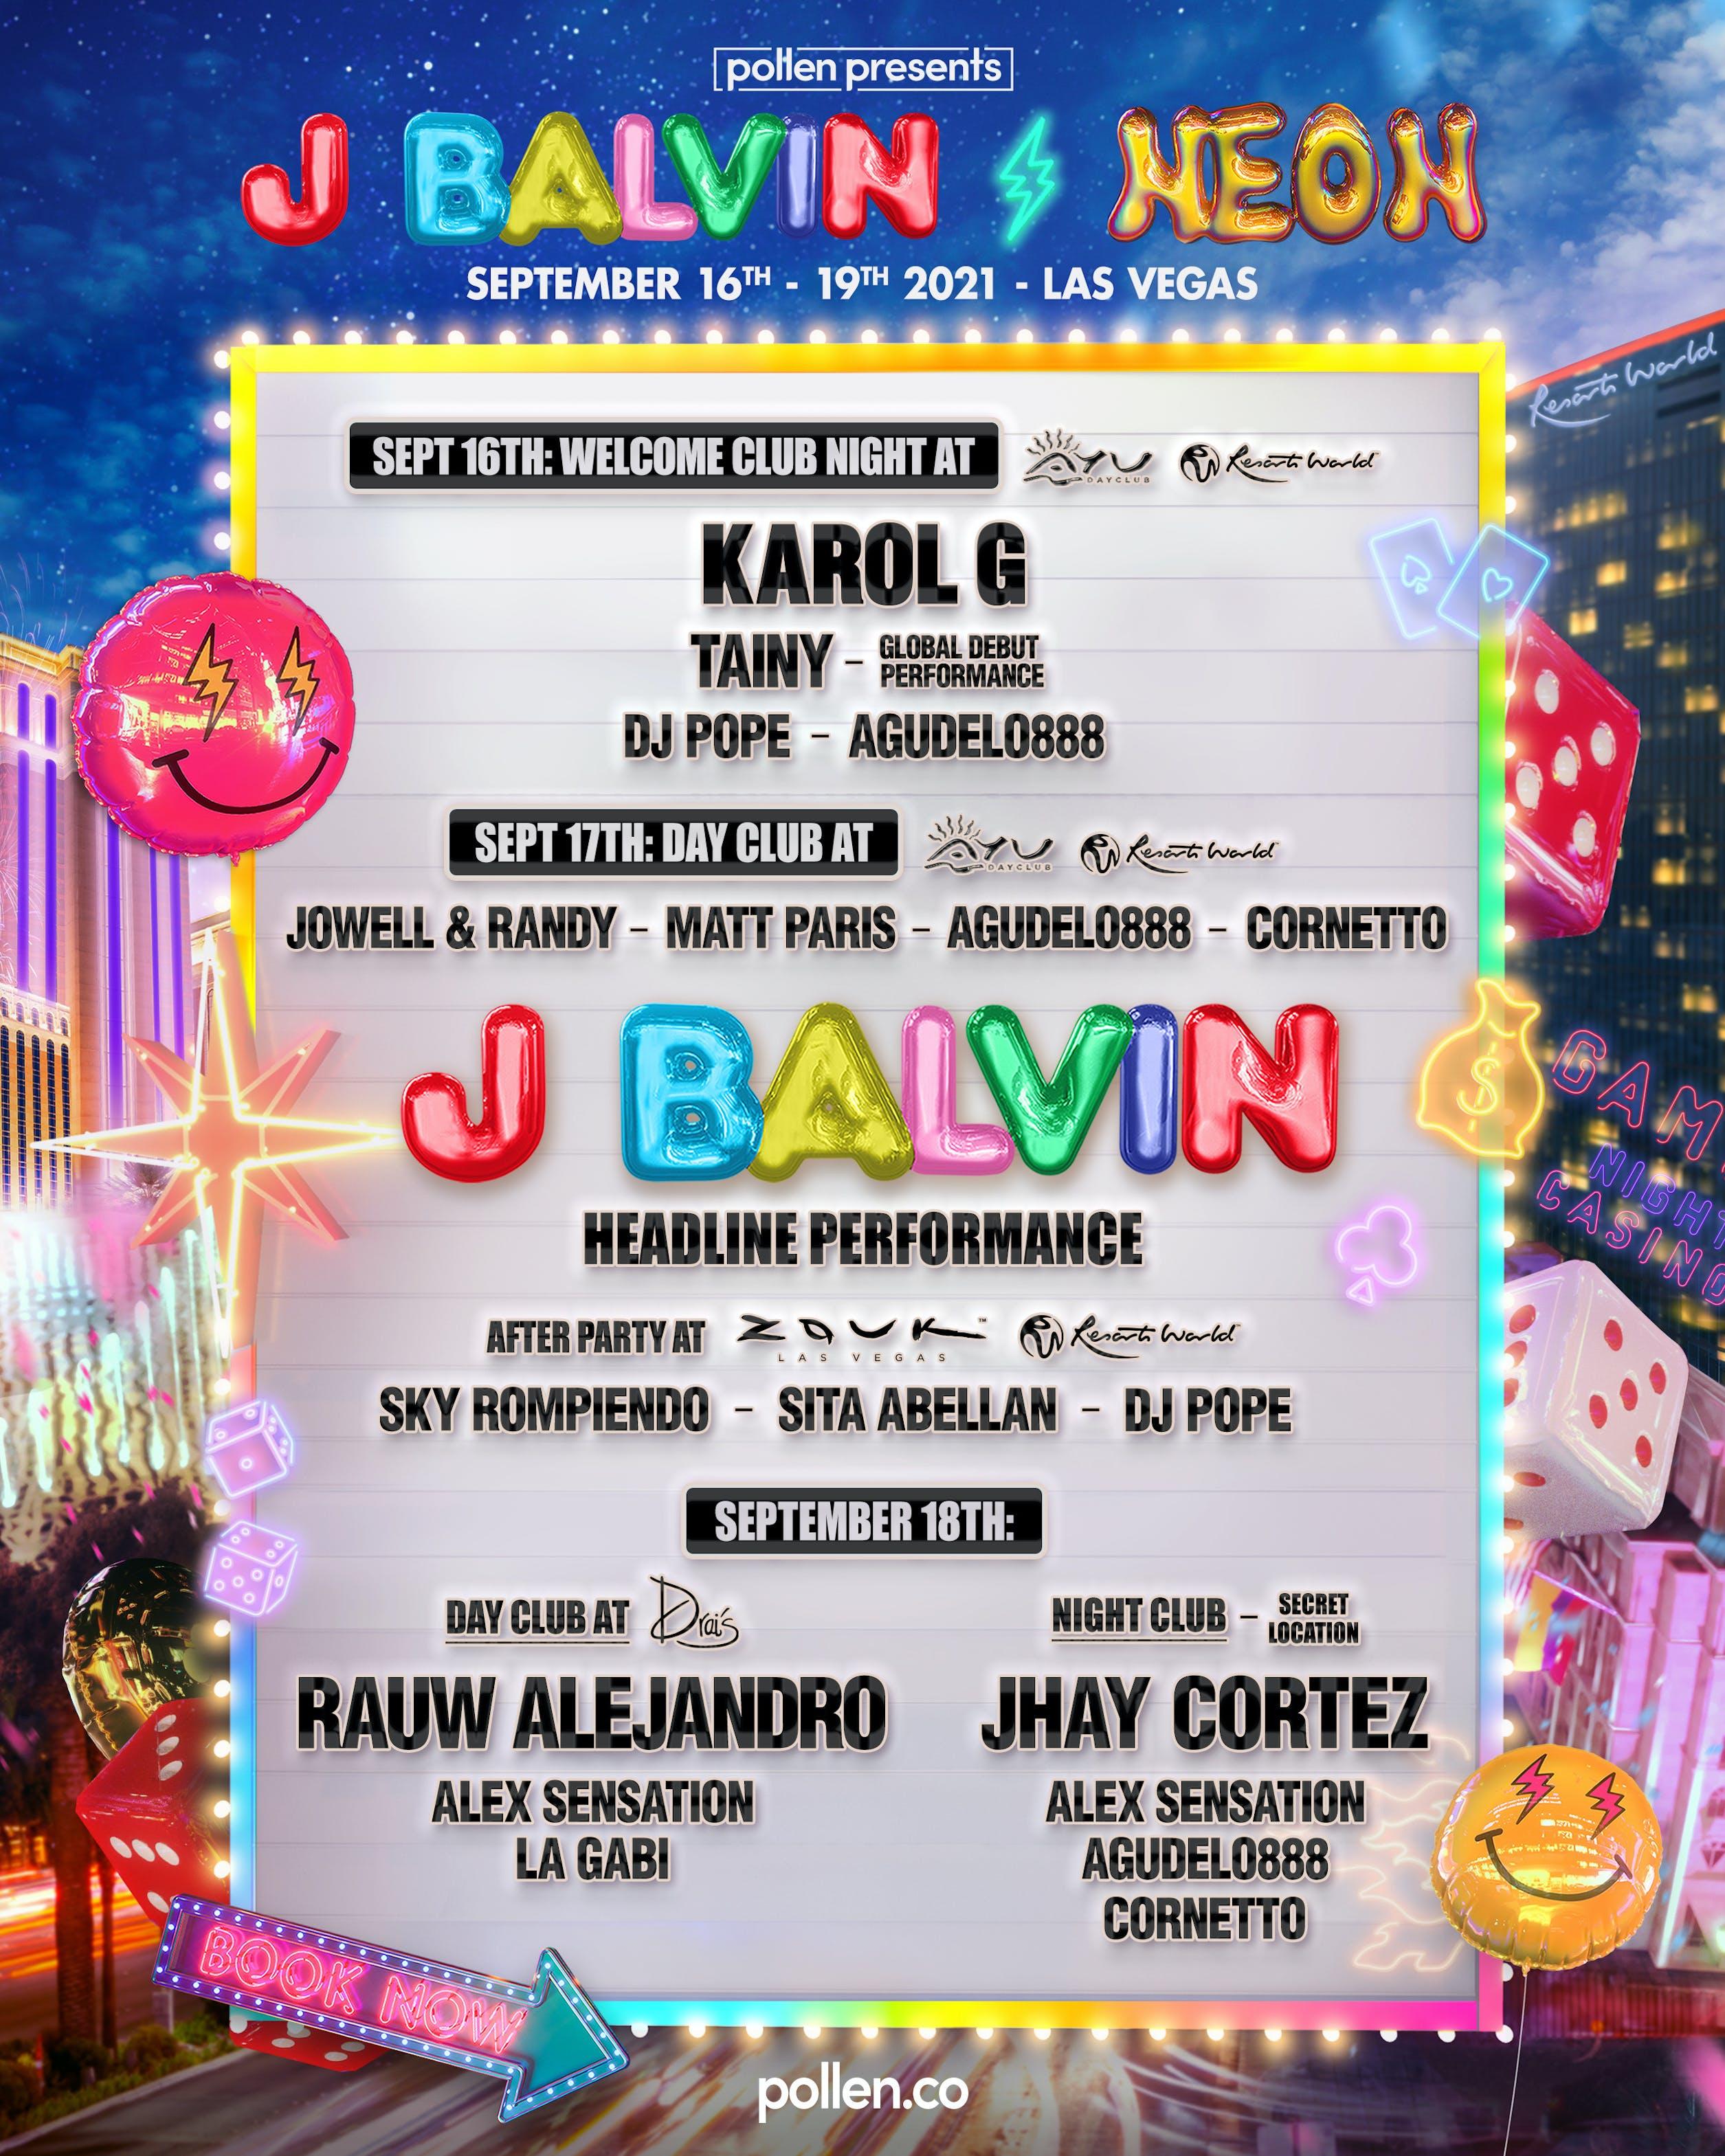 J Balvin Neon Las Vegas 2021 Sold Out Group Travel Trips Events Festivals More Pollen Presents